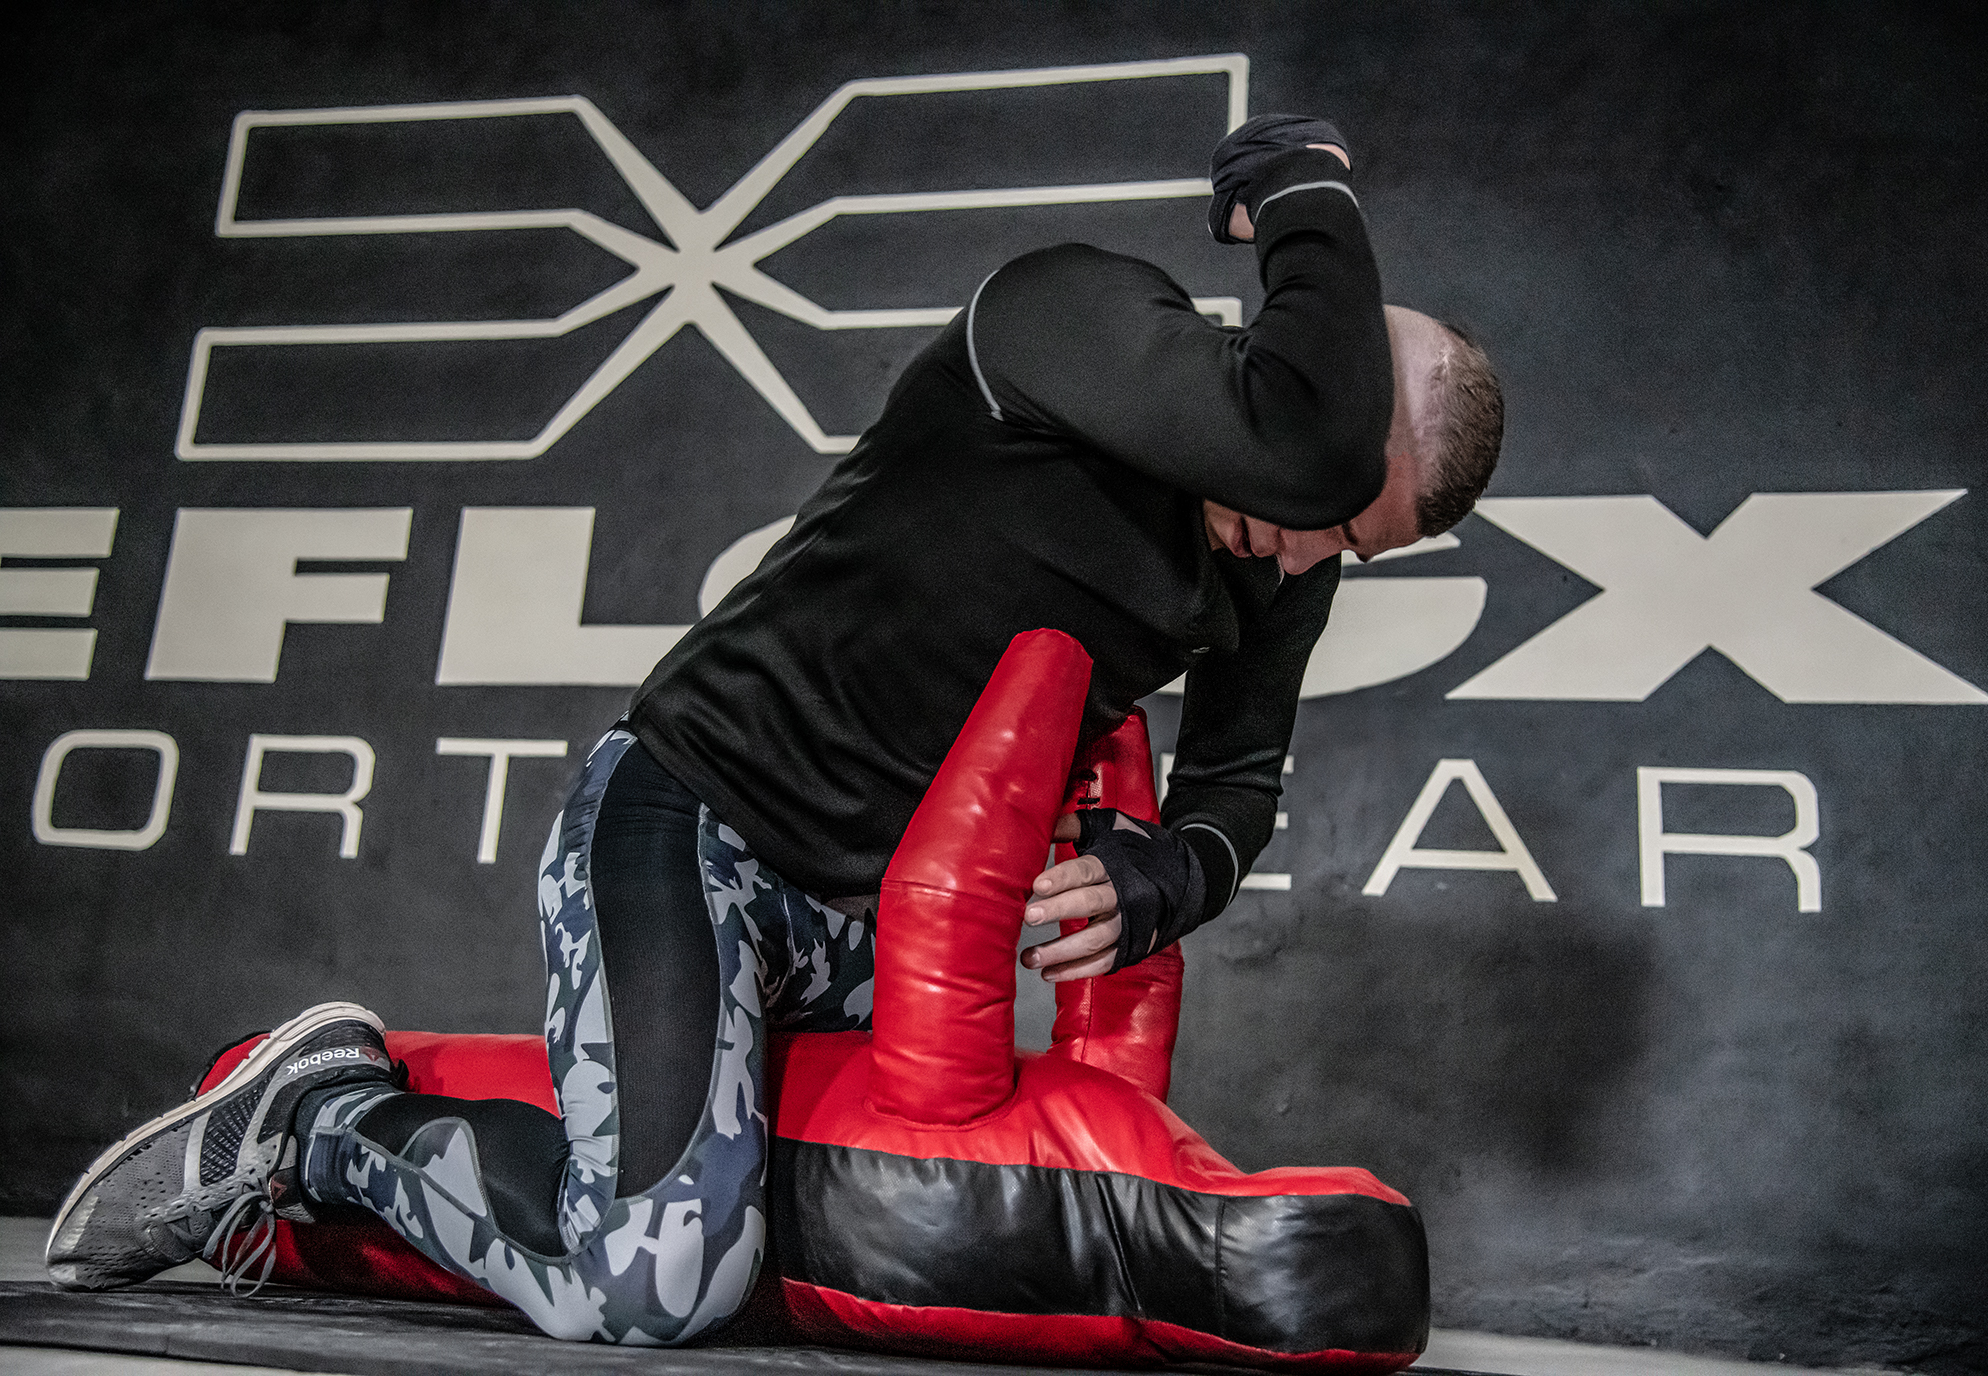 FEFLOGX Sportswear, MMA-Training Shooting in Leggings Camou und Longsleeve.